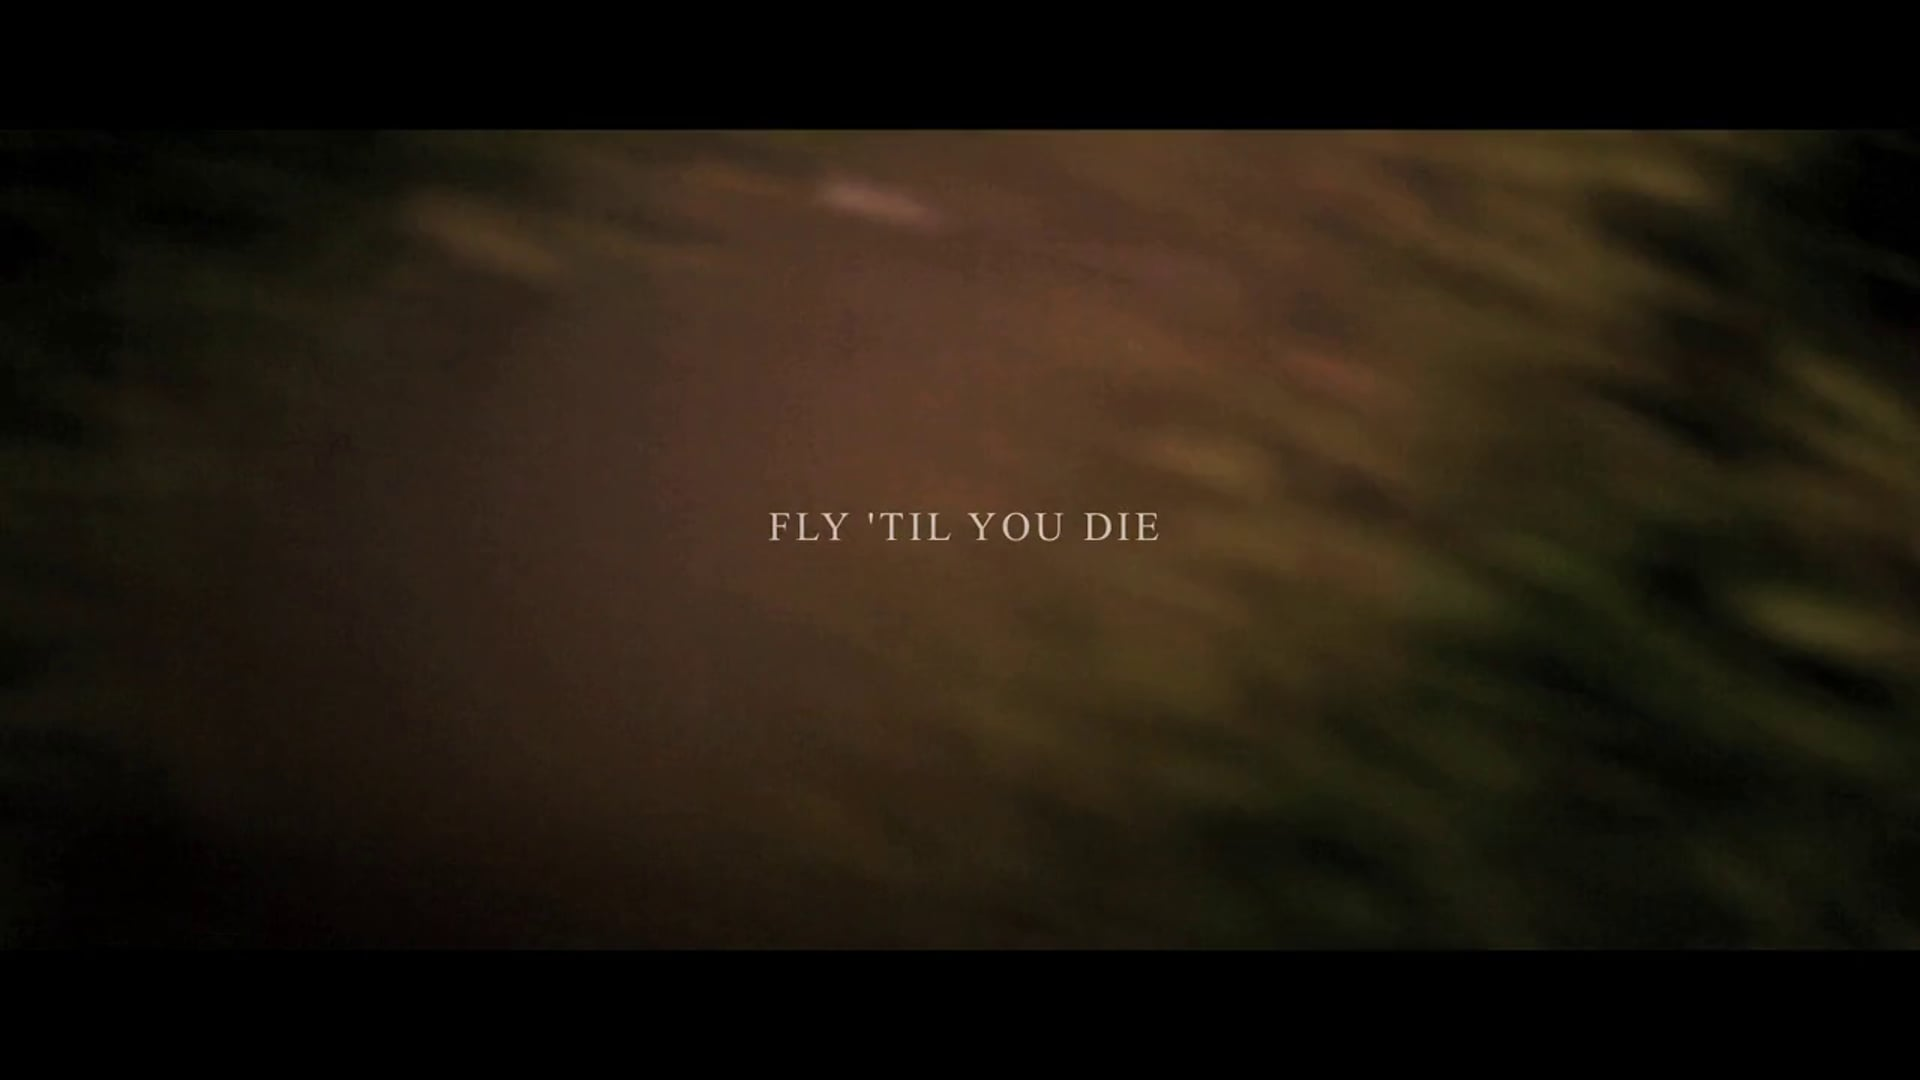 Fly 'Til You Die (Commission by Bacardi Ltd.)